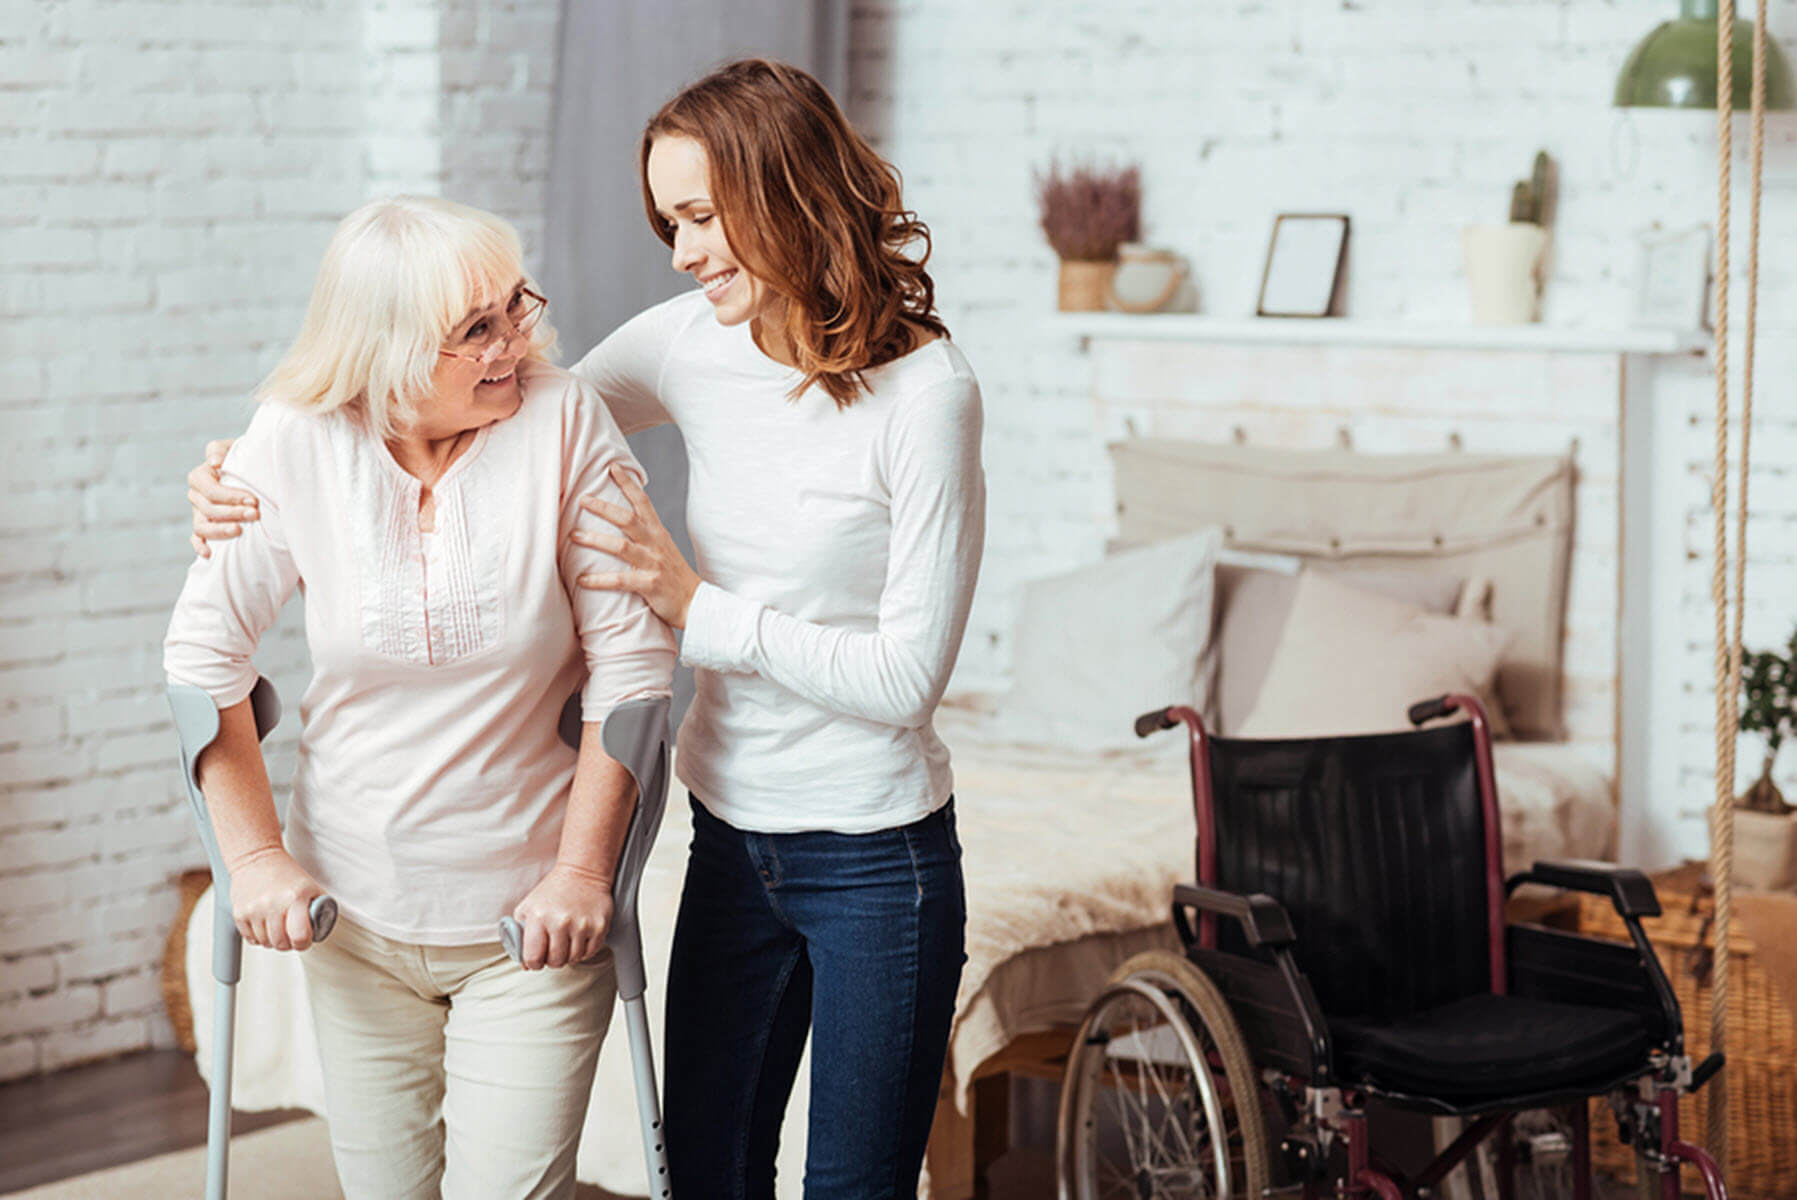 Elder Care in Fairhope AL: Make Caregiving More Enjoyable